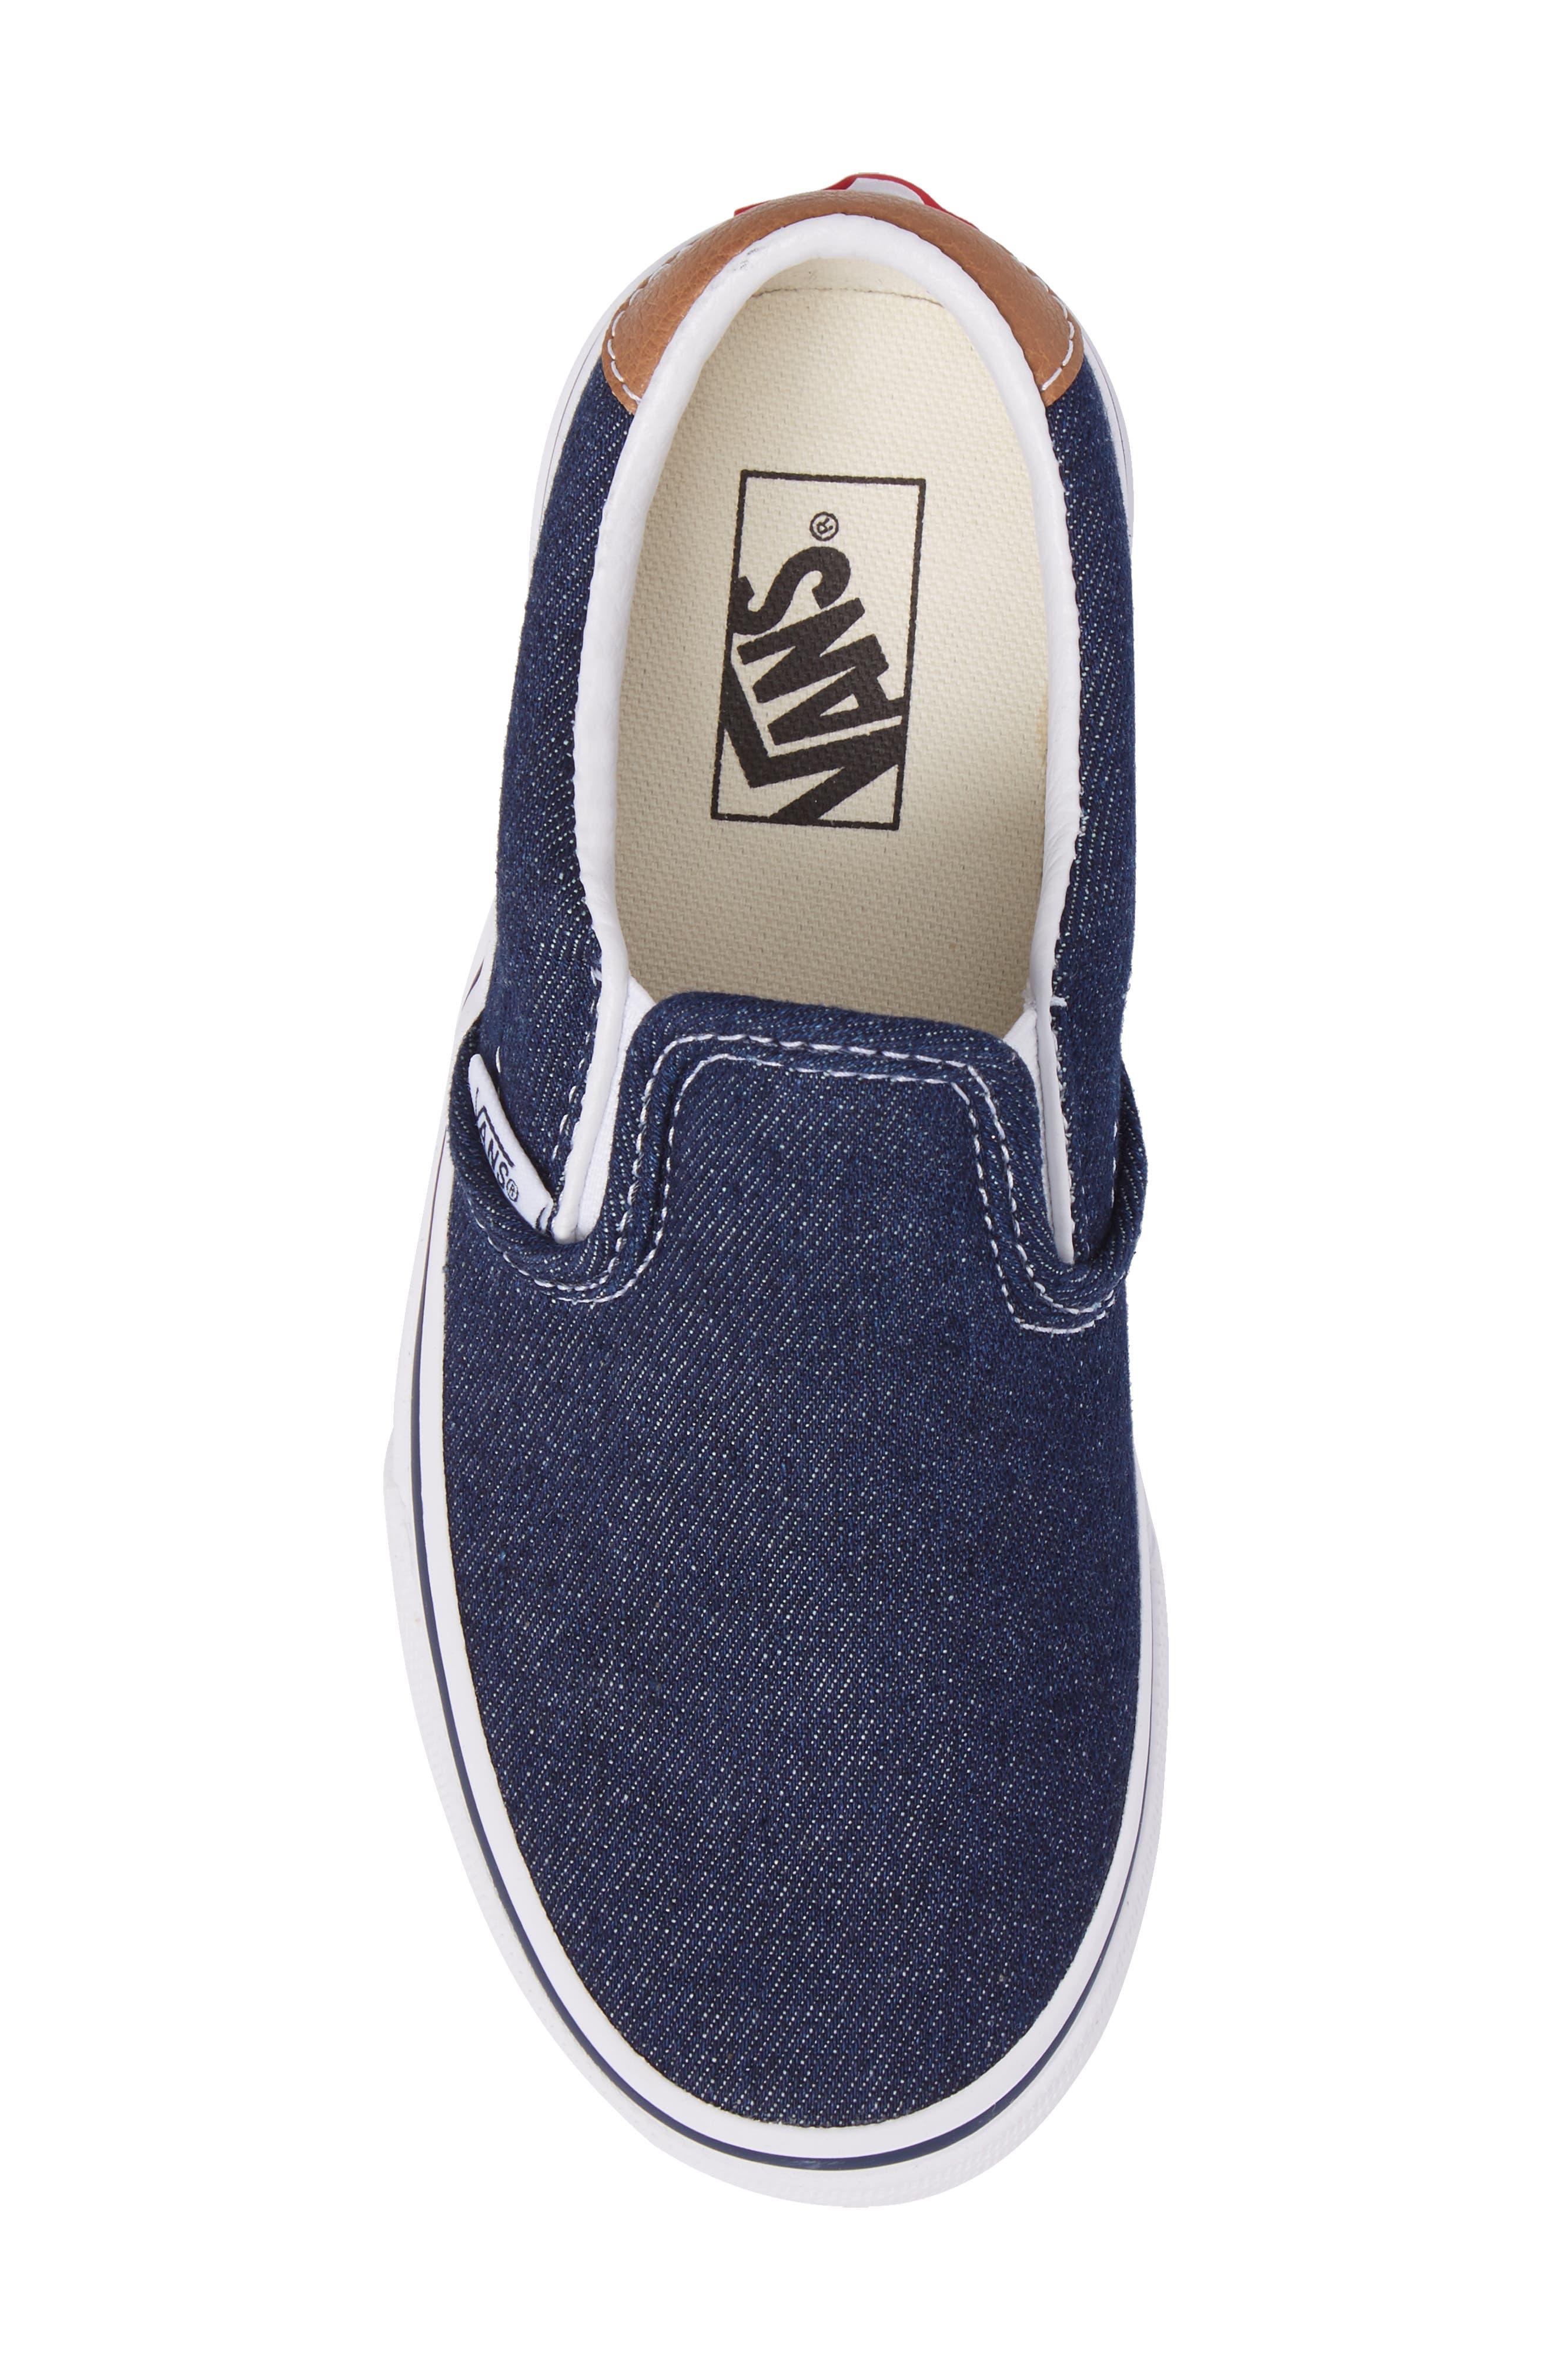 Denim C&L Slip-On 59 Sneaker,                             Alternate thumbnail 5, color,                             Denim Dress Blues/ Chipmunk